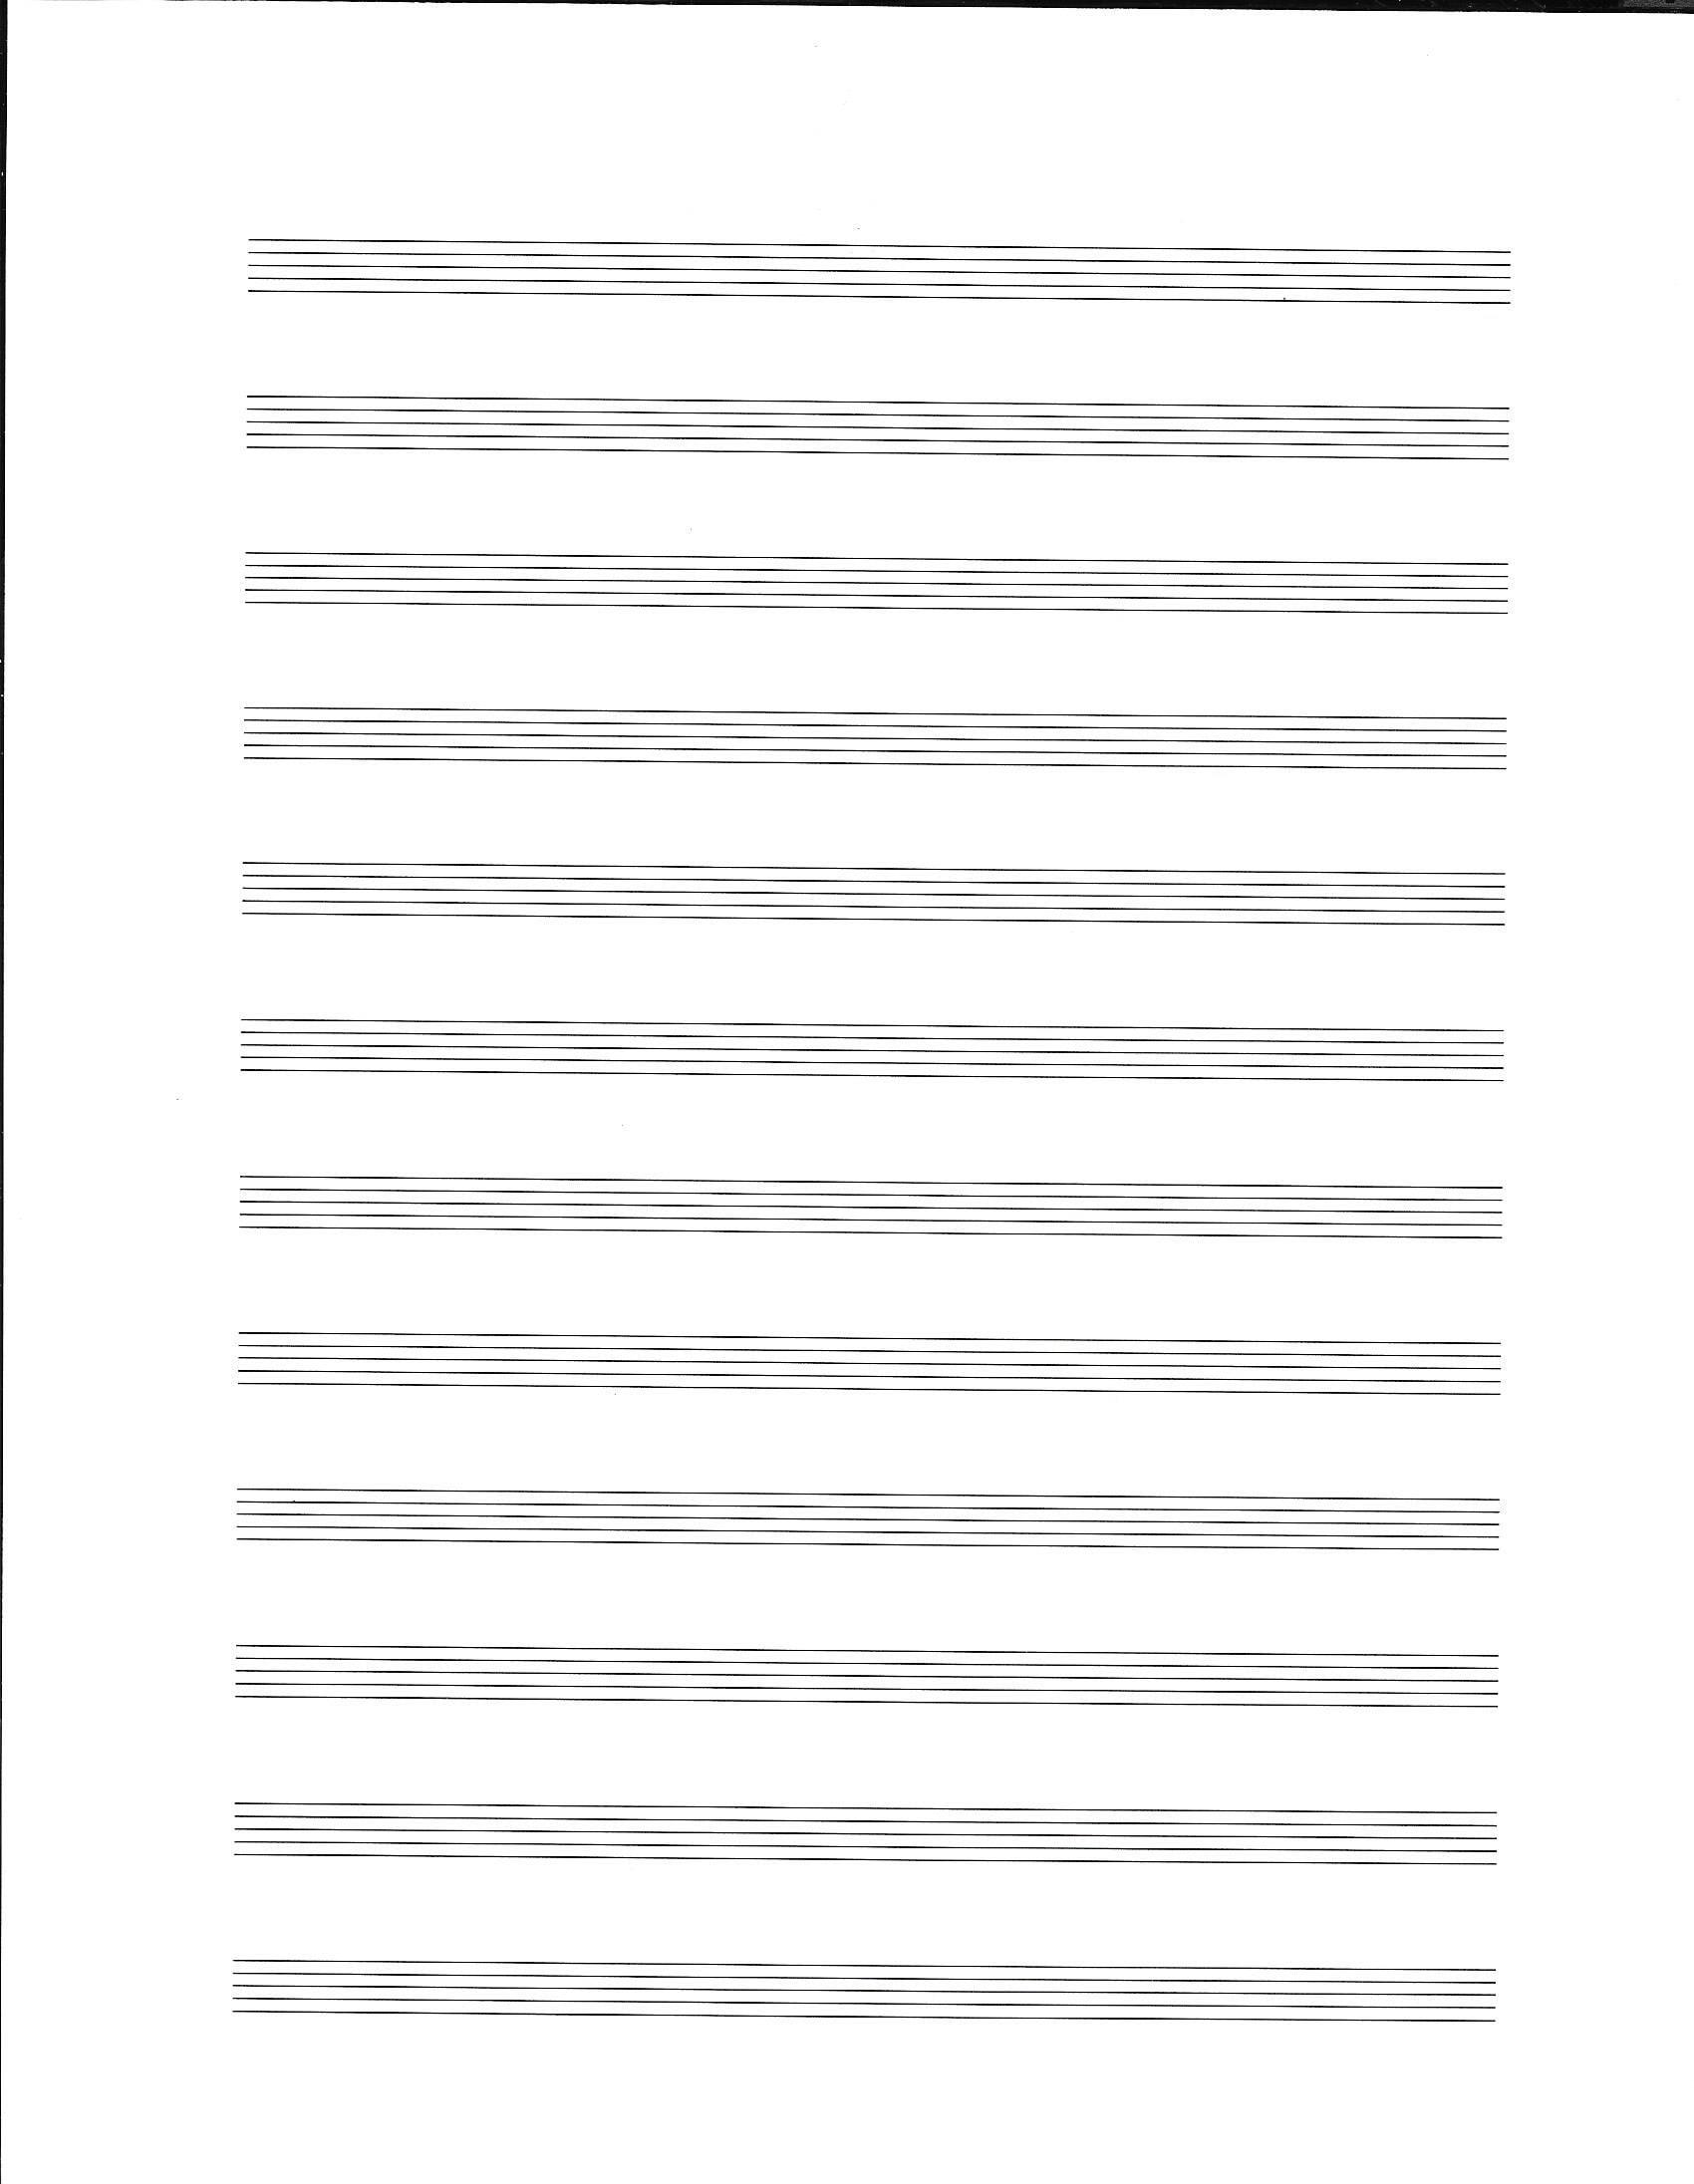 Pin By Vanessa Knowles On Piano Music Sheet Music Good Music Piano Music